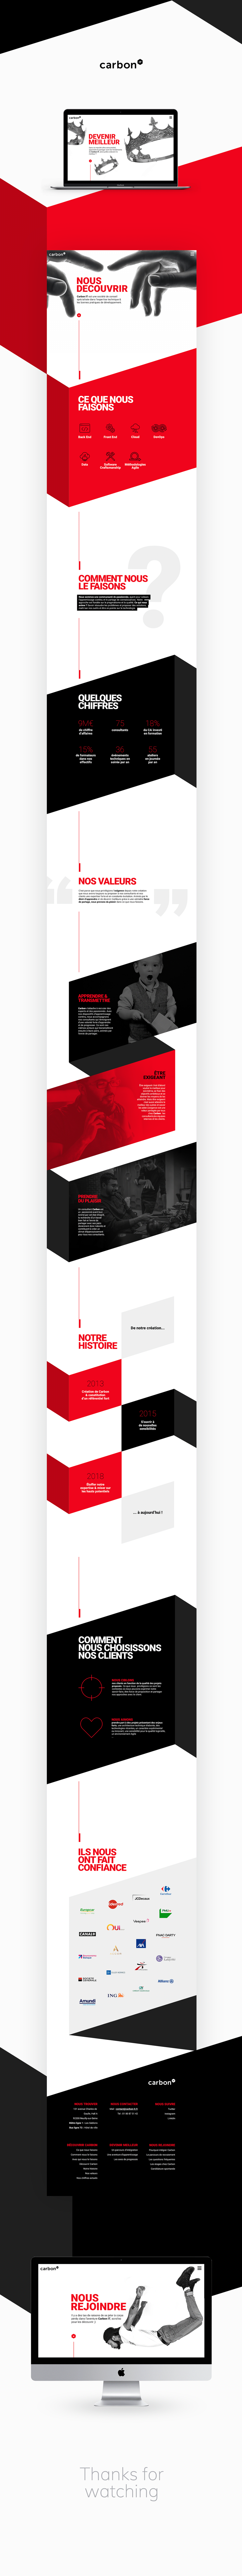 ArtDirection design directionartistique graphic HTML photoshop Web Webdesign